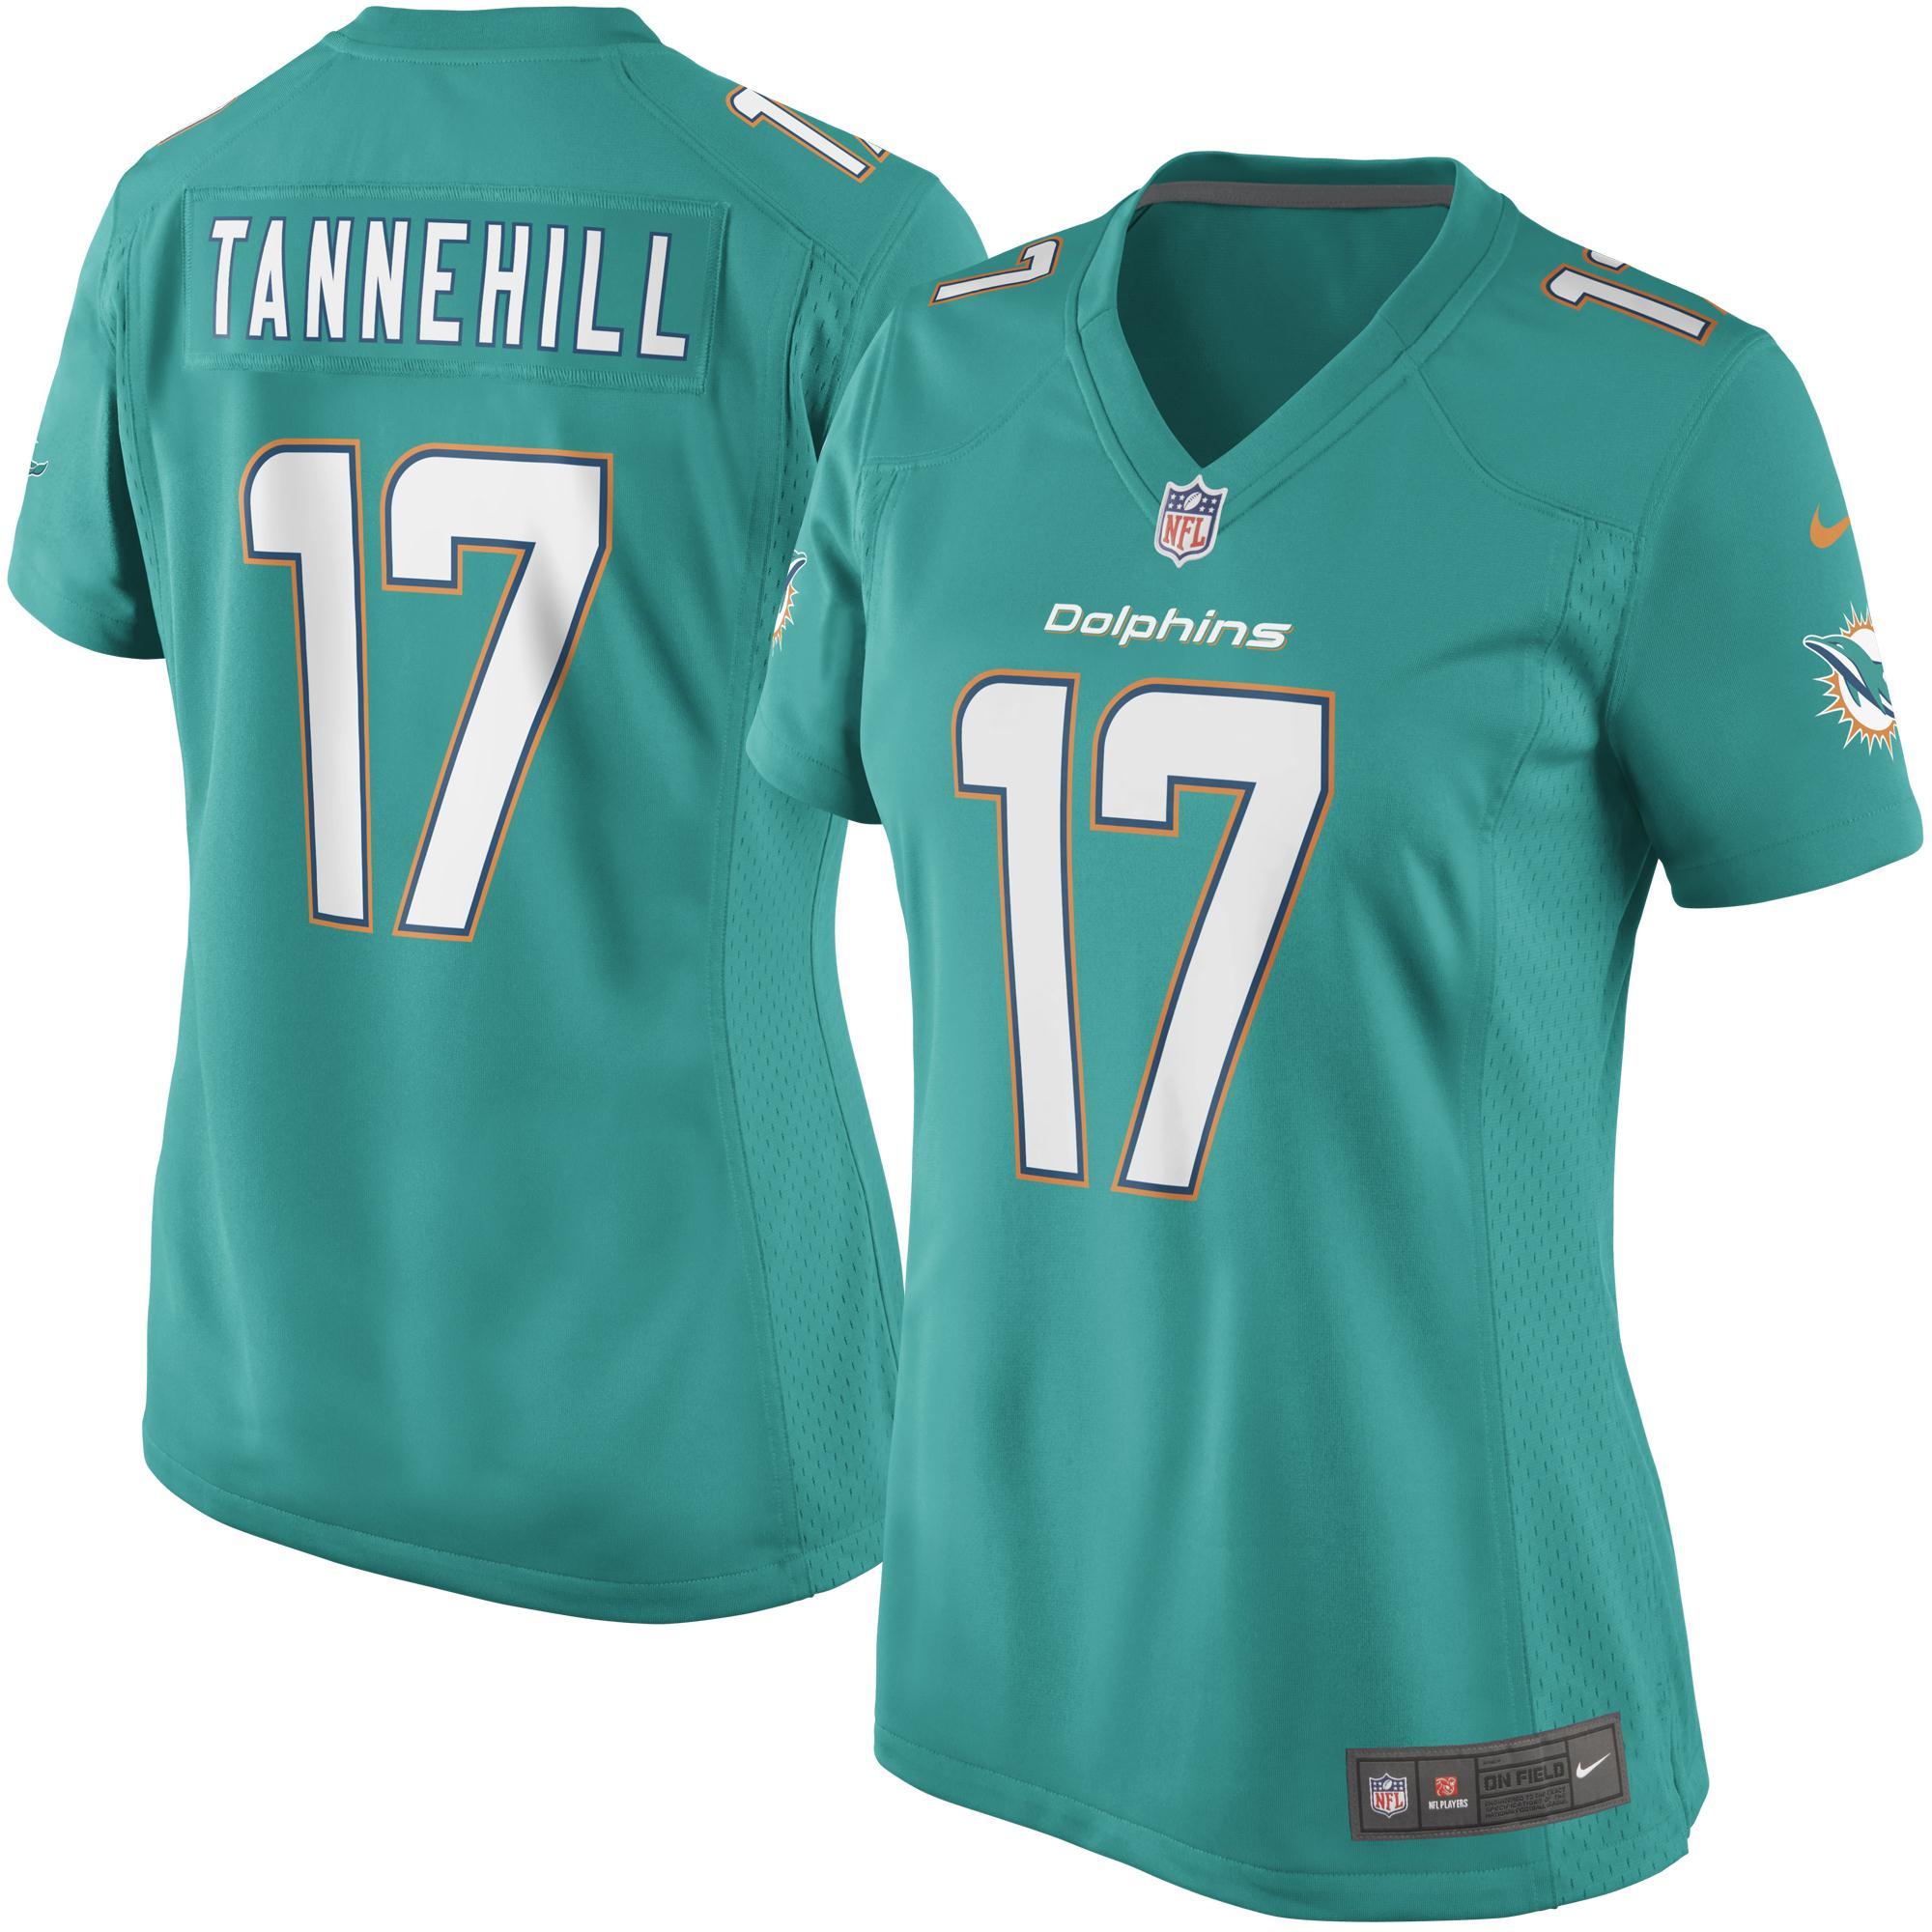 Ryan Tannehill Miami Dolphins Nike Women's Game Jersey - Aqua